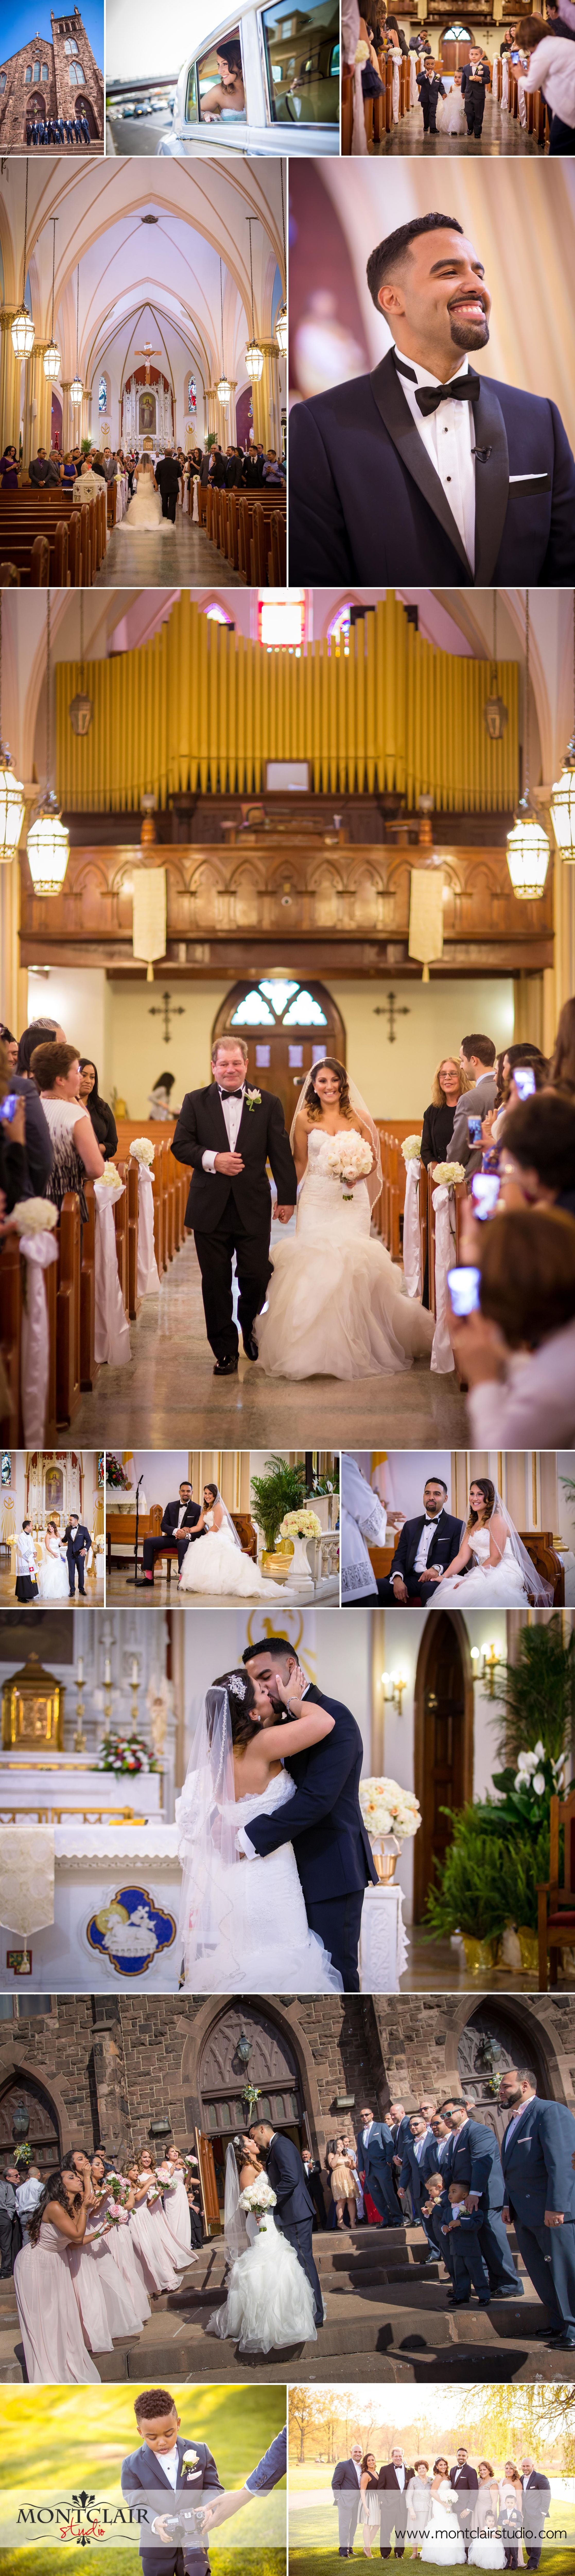 Wedding Jessica and Apolinar 2.jpg